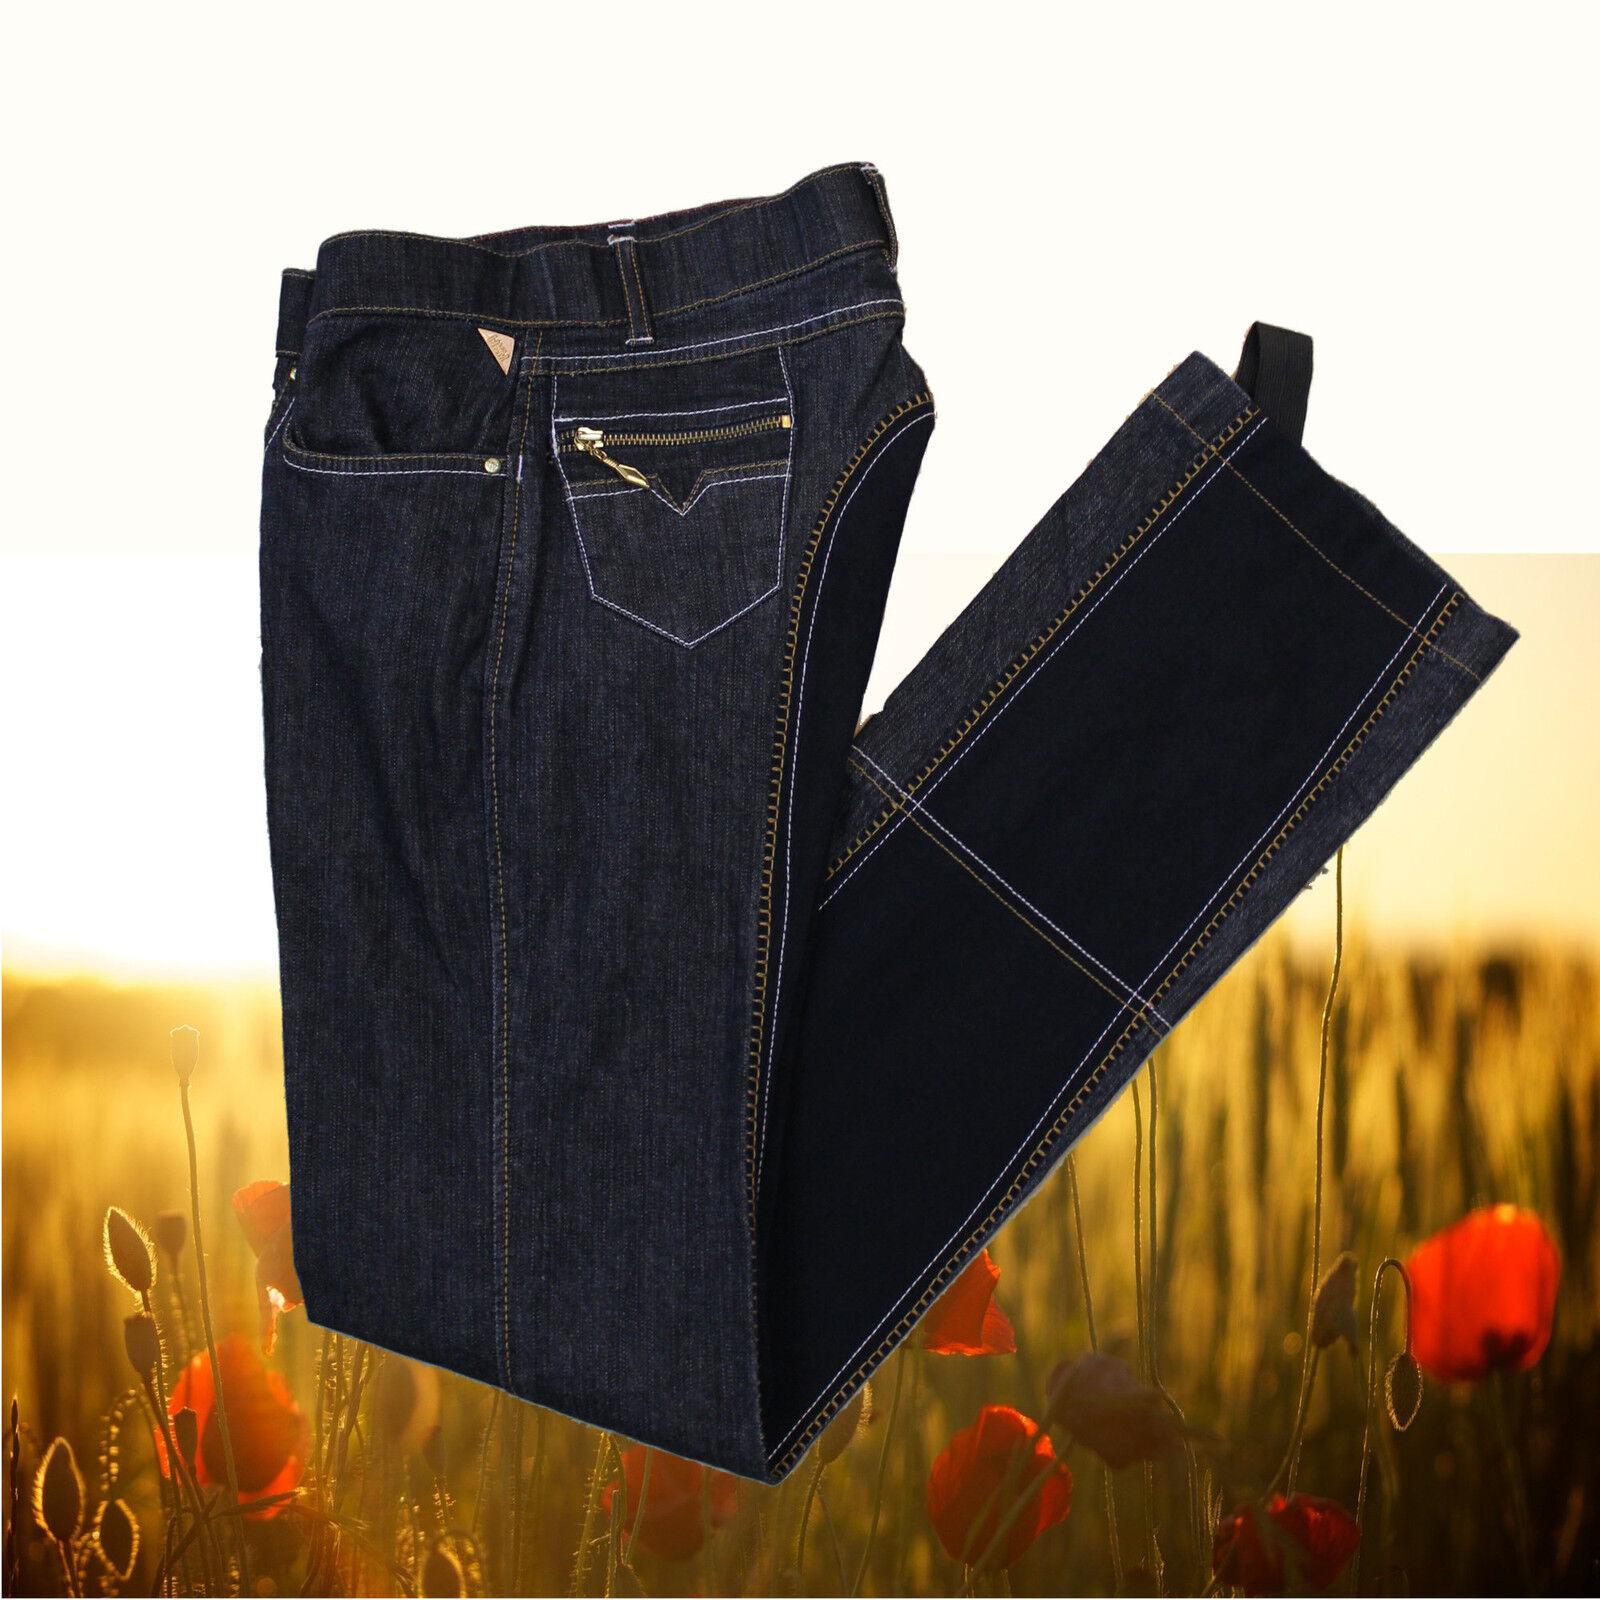 Lauria Garrelli Kinder Jodhpur Reithose Jeans, Kids Ganzbesatz Jodhpurreithose Ganzbesatz Kids aadcfe